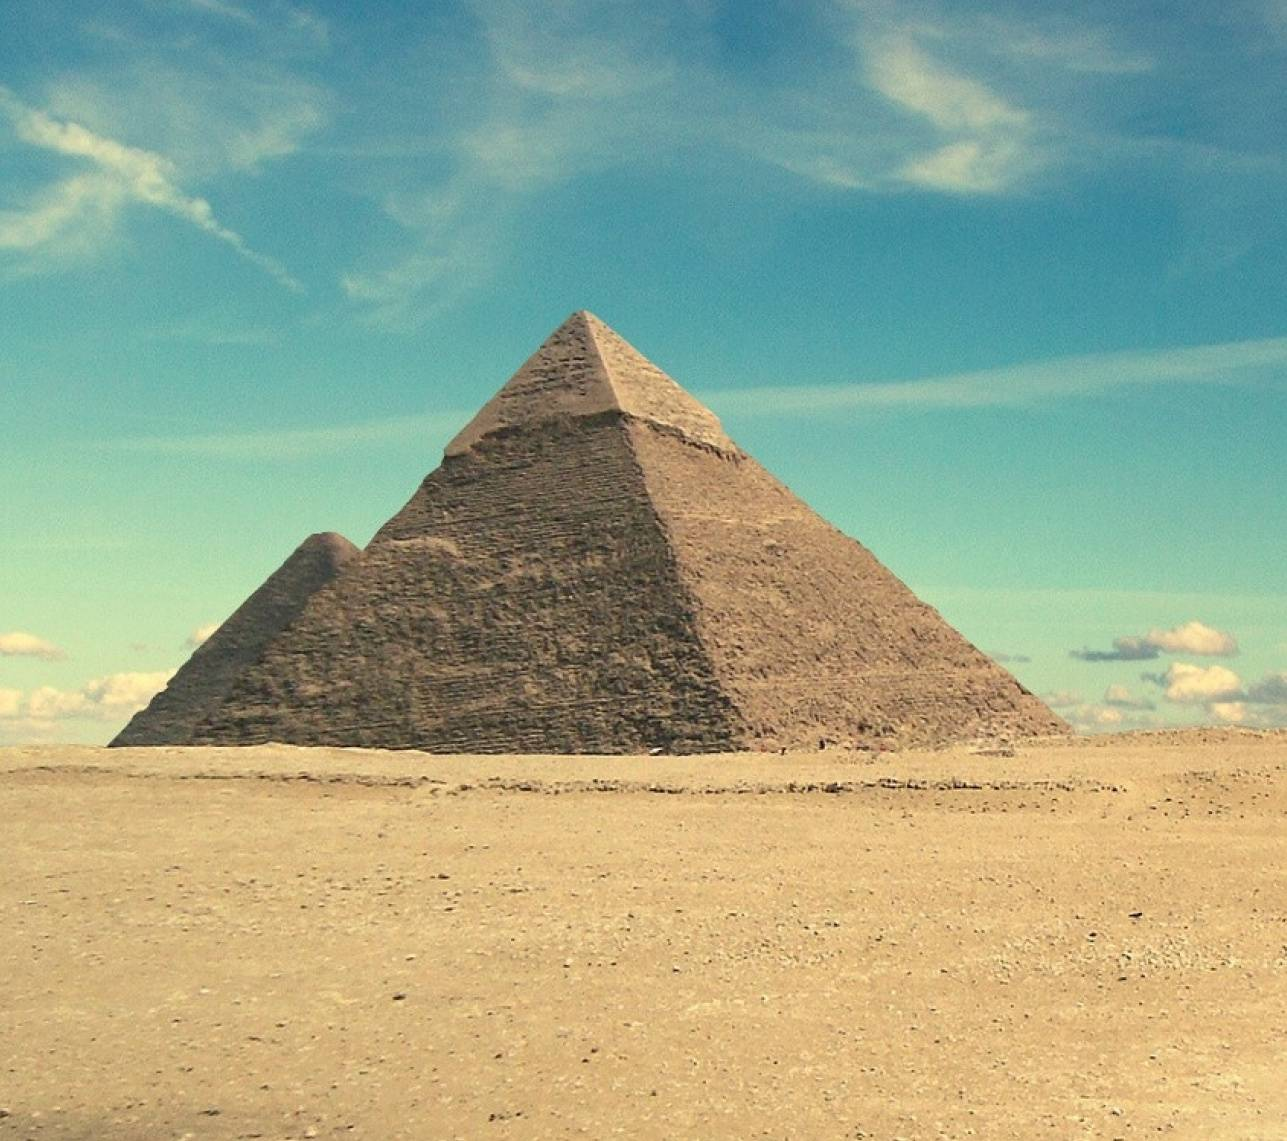 Desert - Pyramid